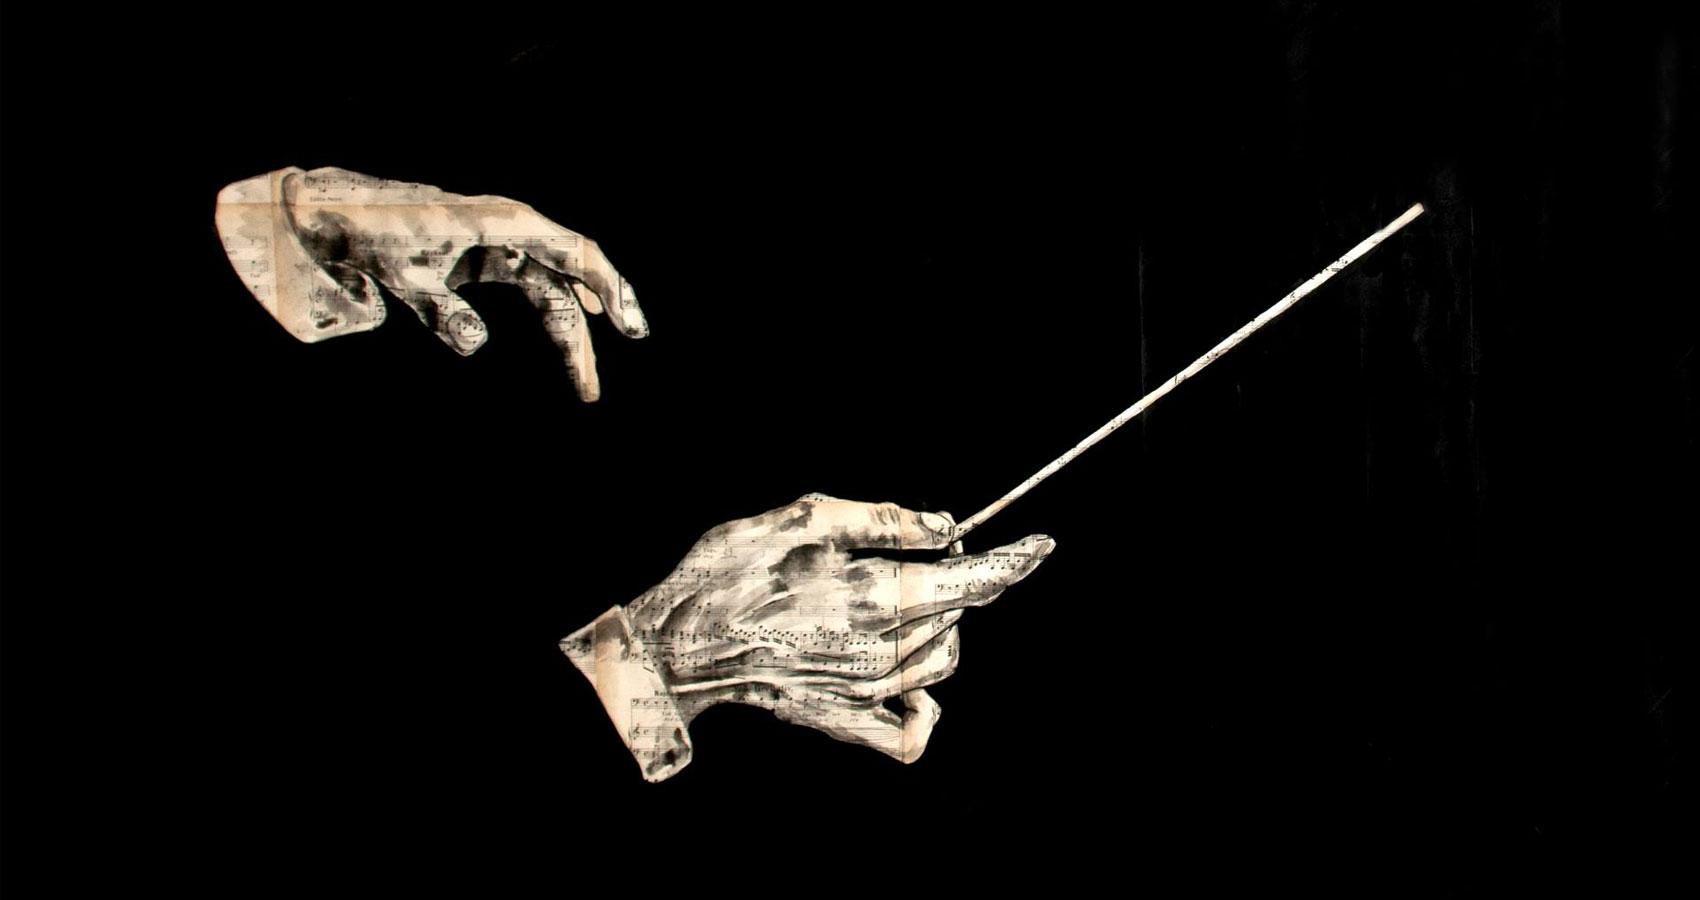 Maestro, by Rob J. Mann at Spillwords.com